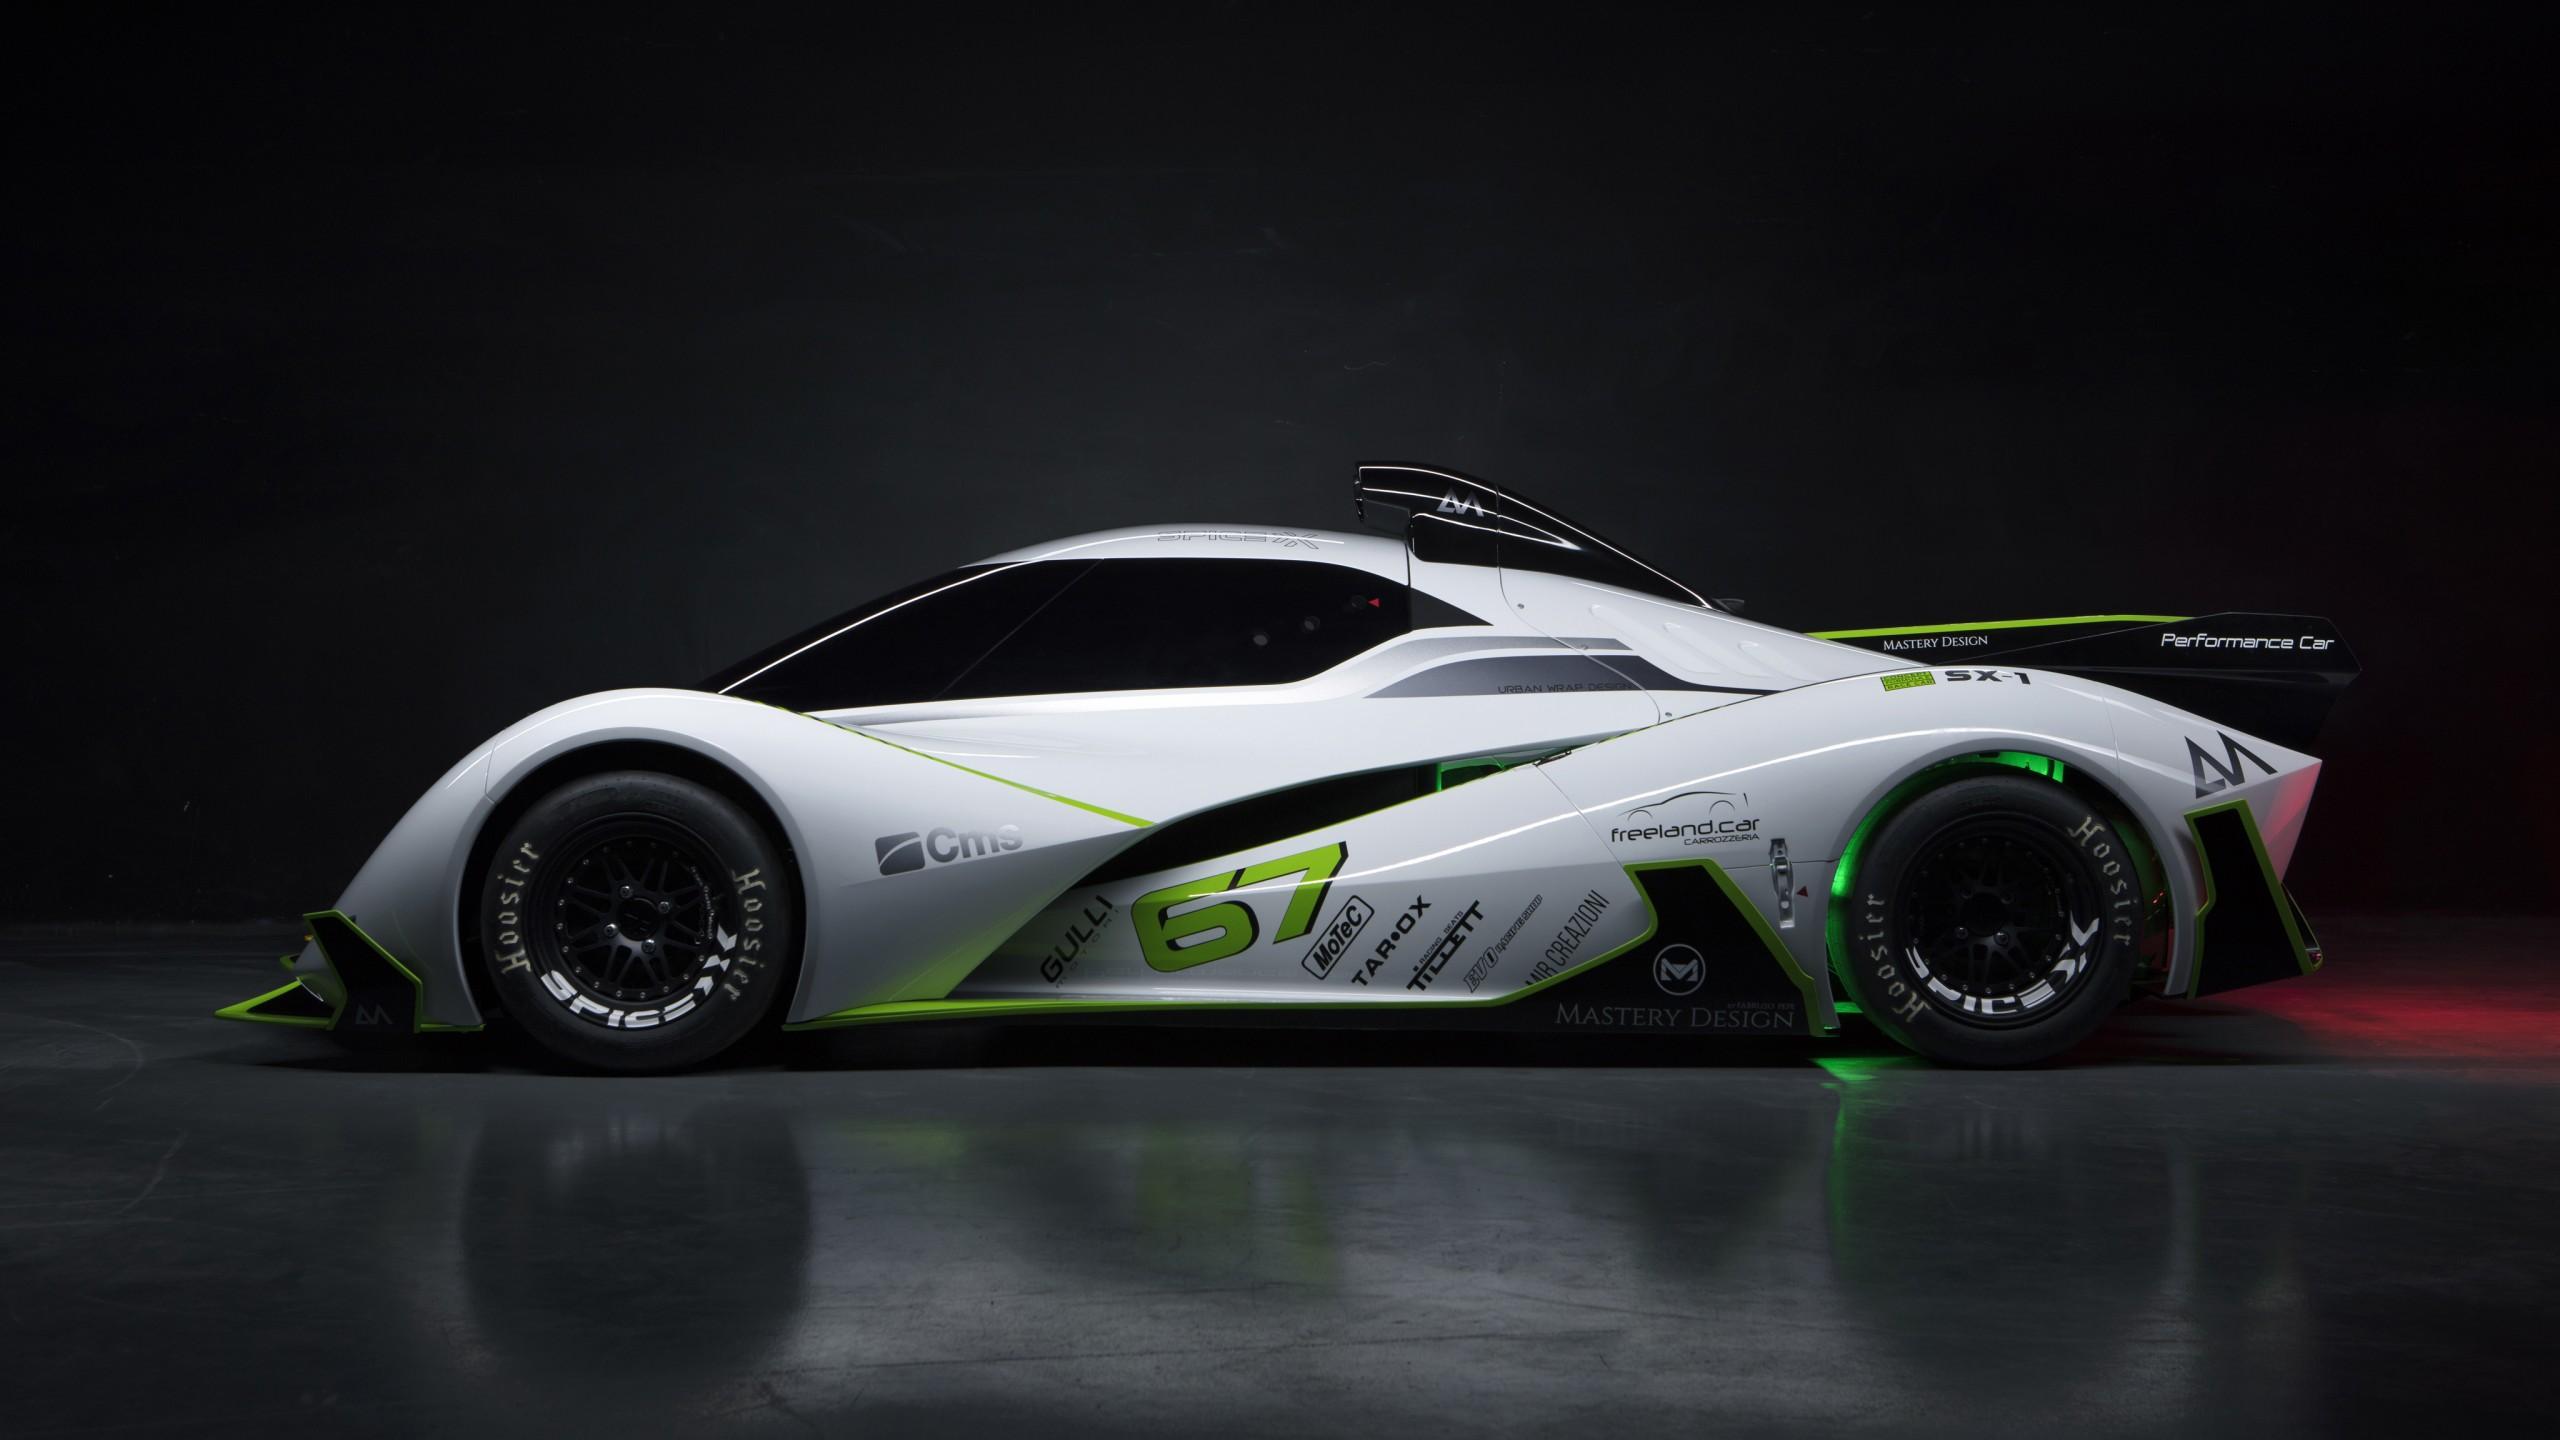 Mitsubishi Electric Car >> Spice-X Concept Electric Racing Car 4K 2 Wallpaper | HD Car Wallpapers | ID #10884